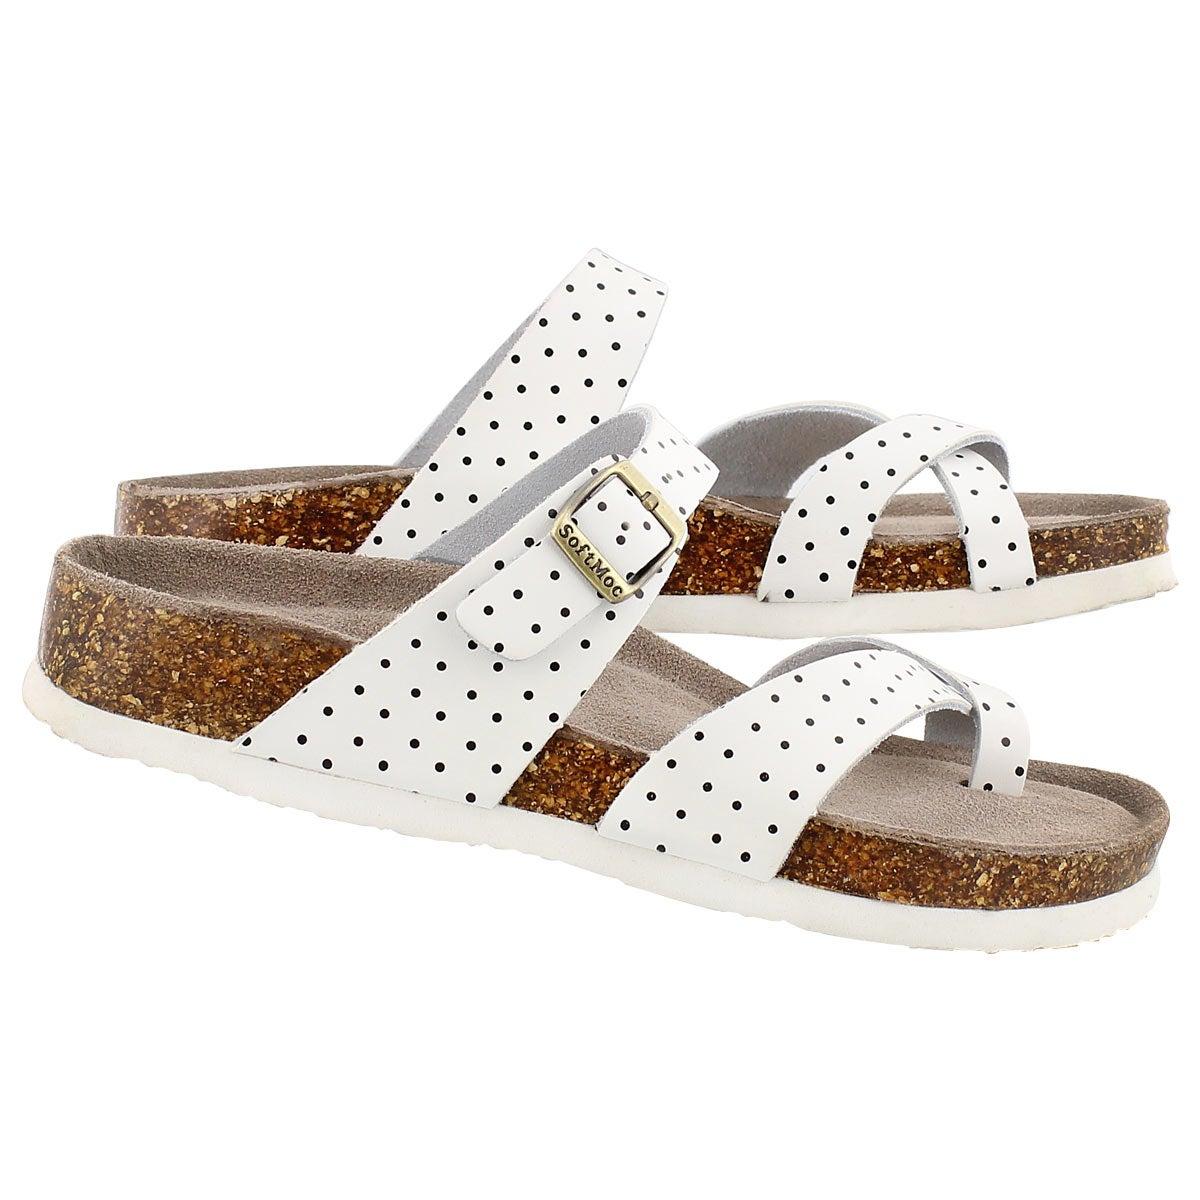 Sandale ALICIA 3, blanc/noir, femmes